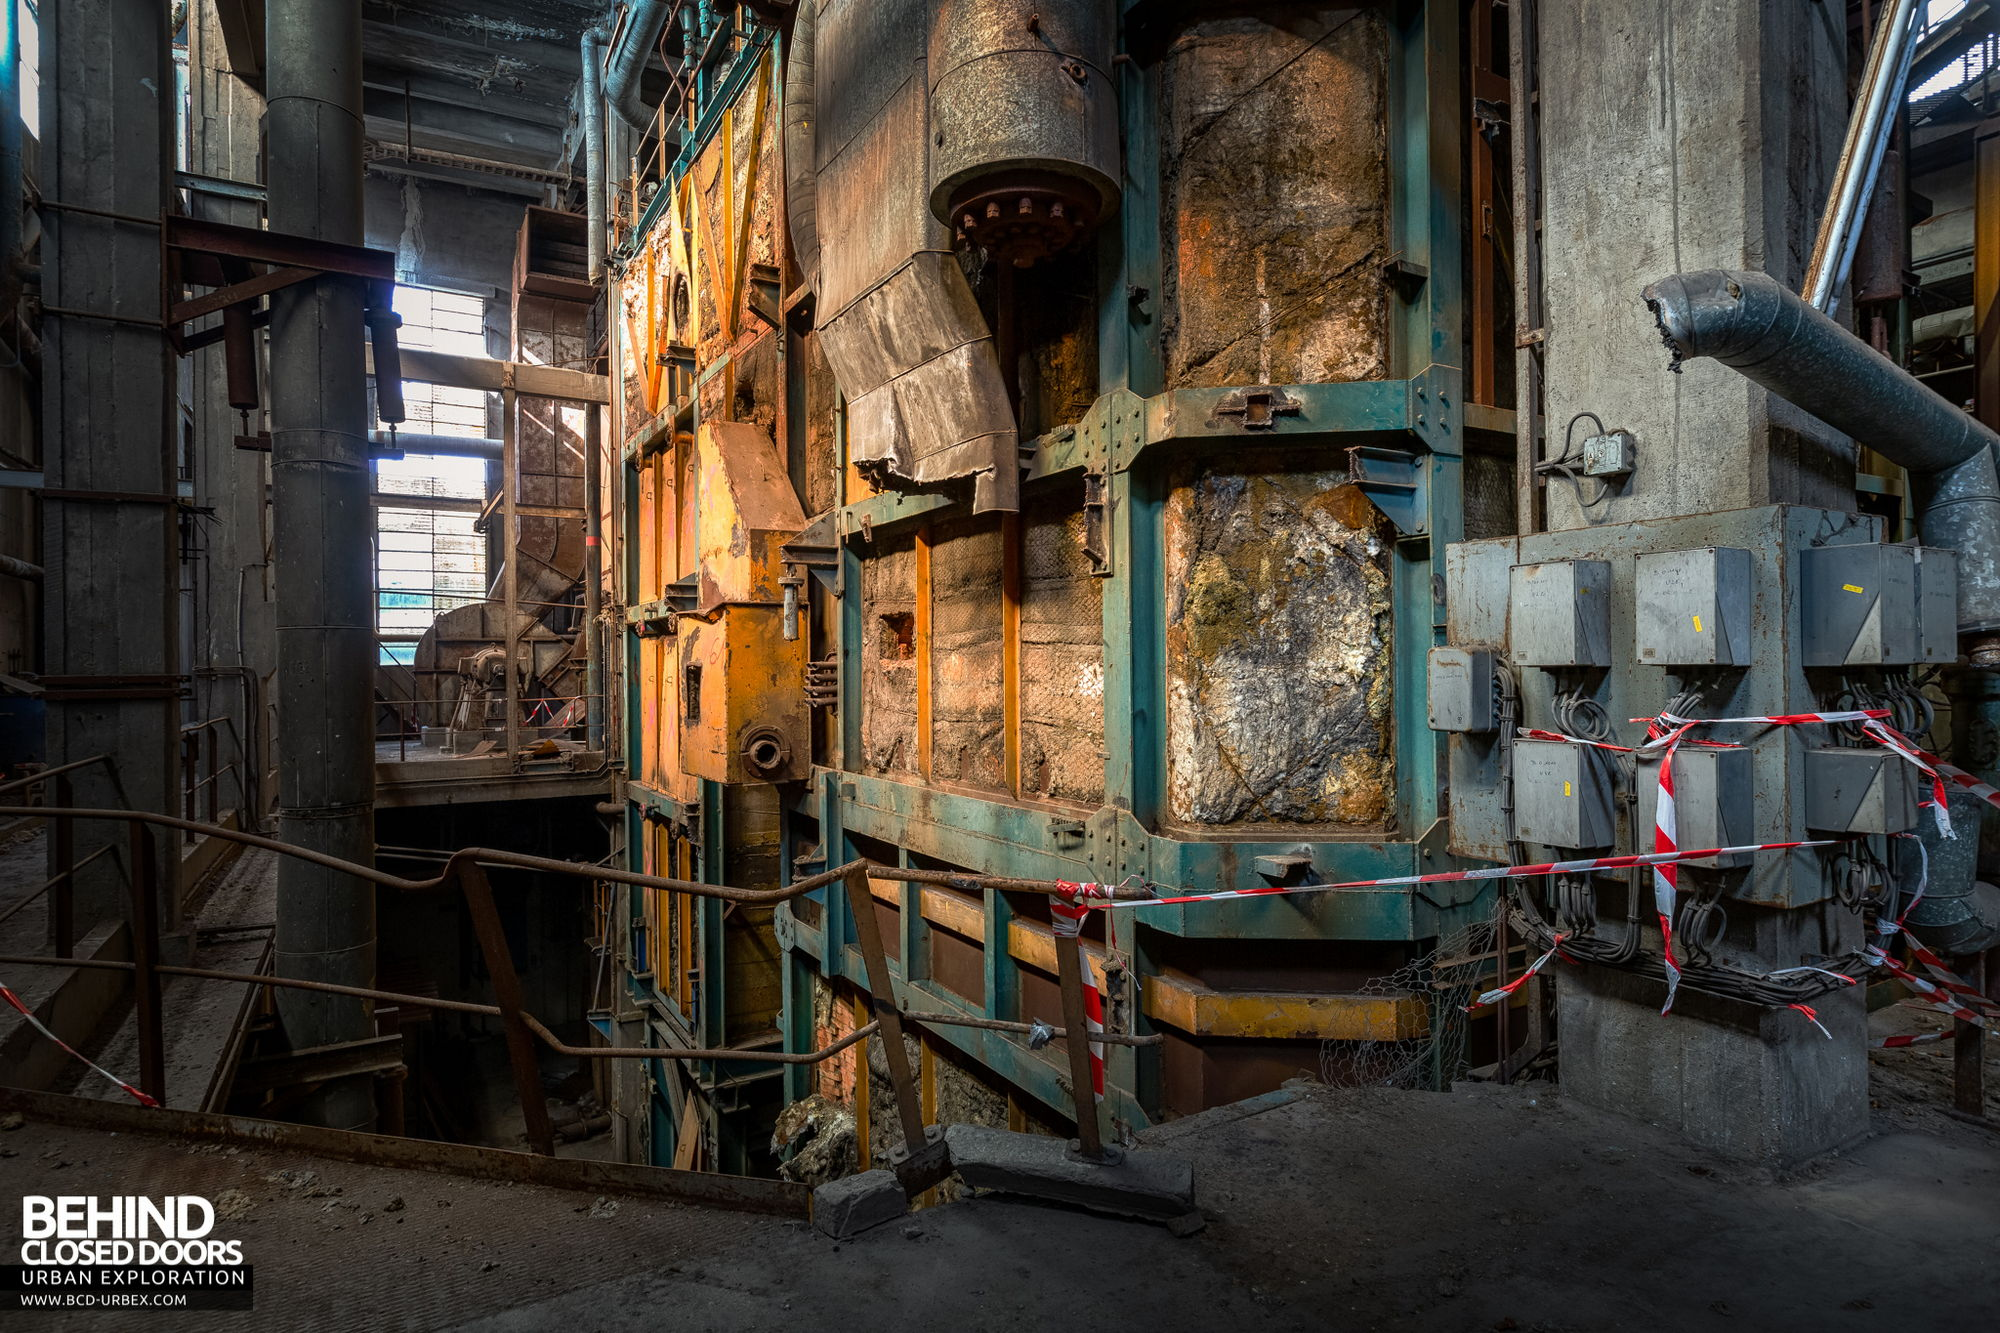 Stora Enso, Corbehem - The huge old boiler